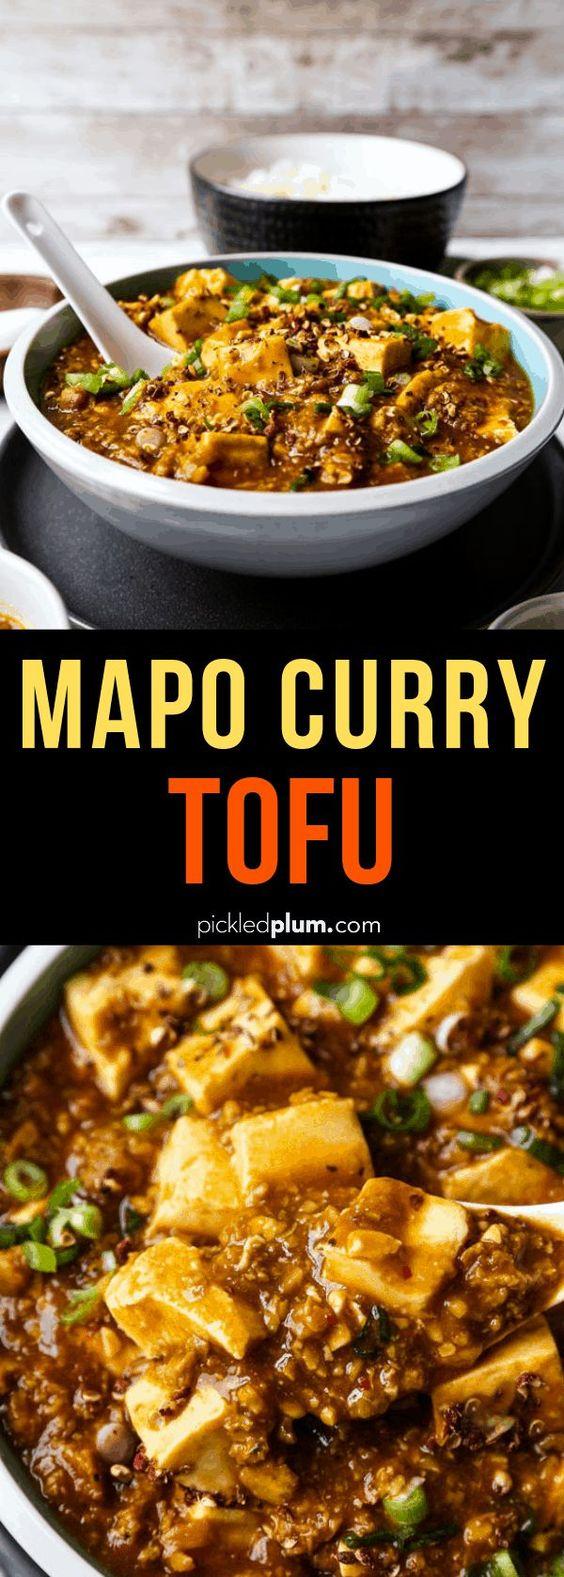 Mapo Curry Tofu (麻婆カレー豆腐️)